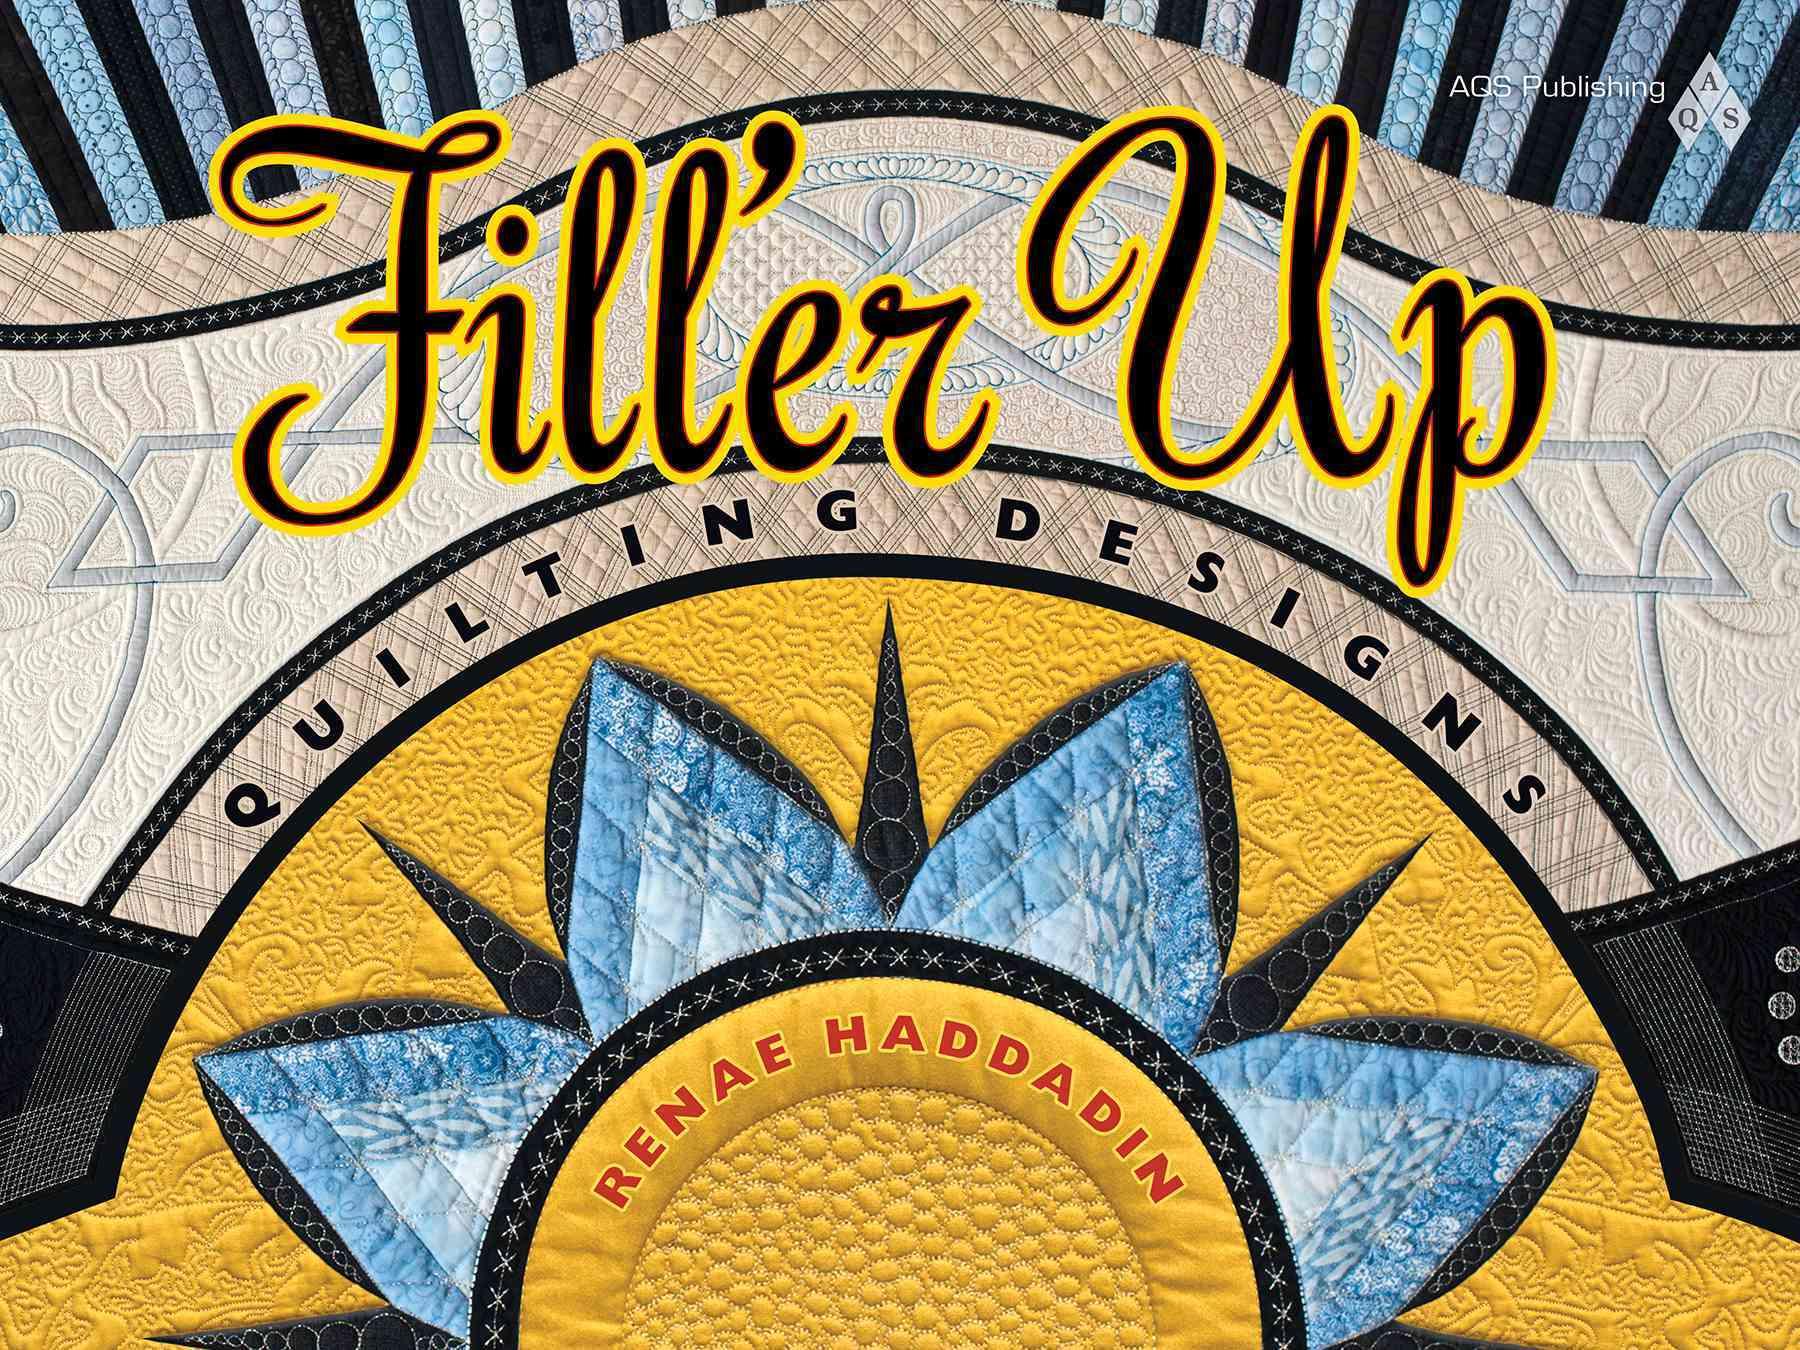 Fill'er Up: Quilting Designs (Paperback)